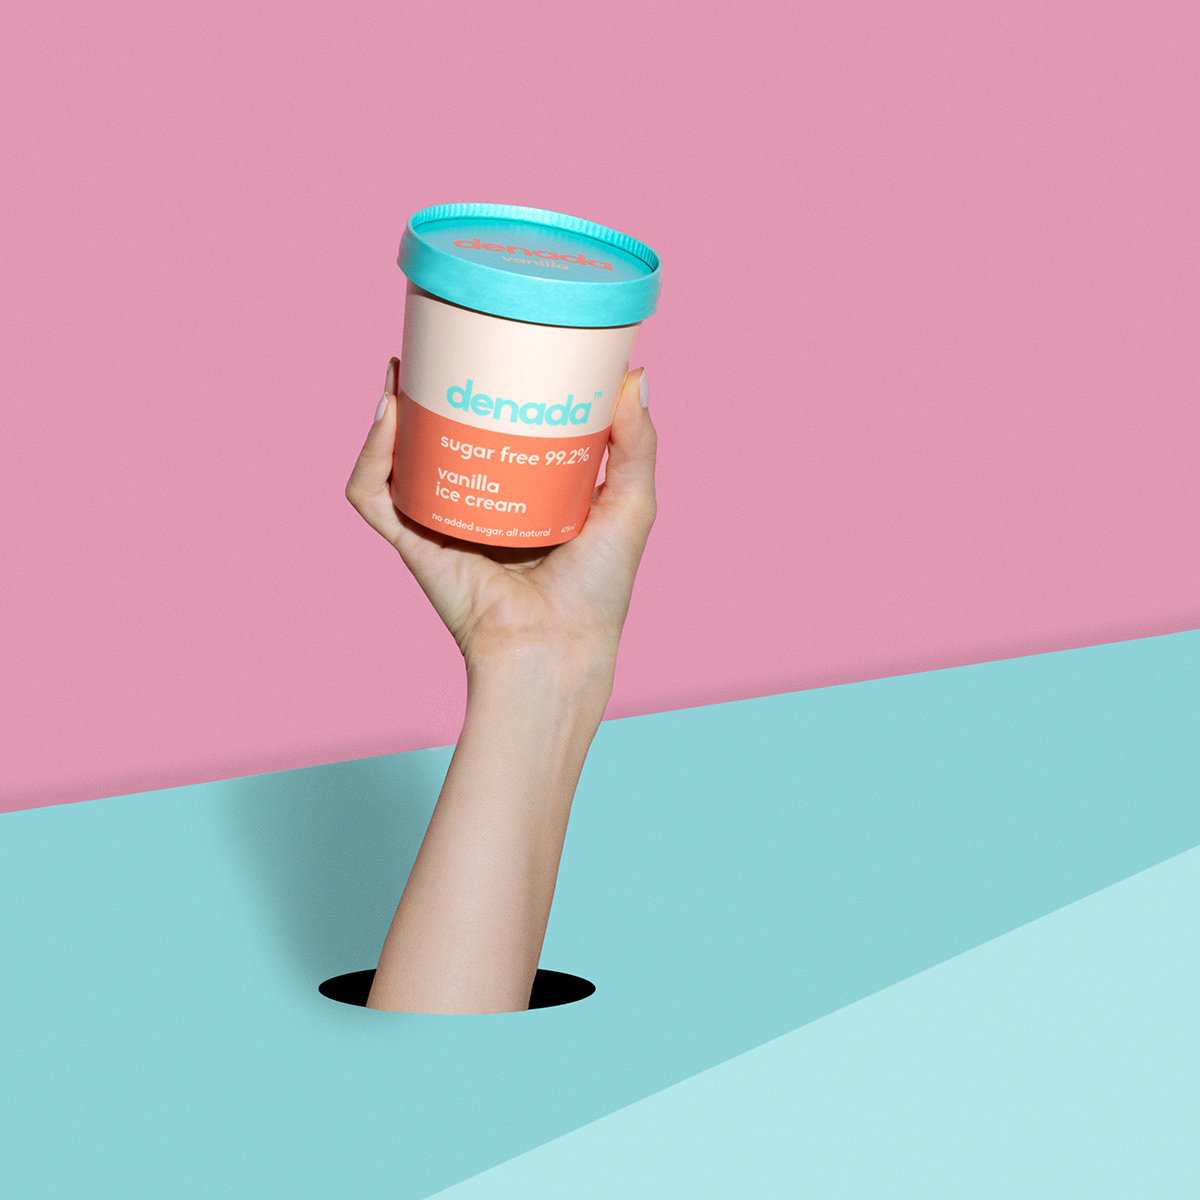 art  direction branding  Denada graphic design  ice cream Ice Cream Packaging Melbourne Packaging packaging design sugar free